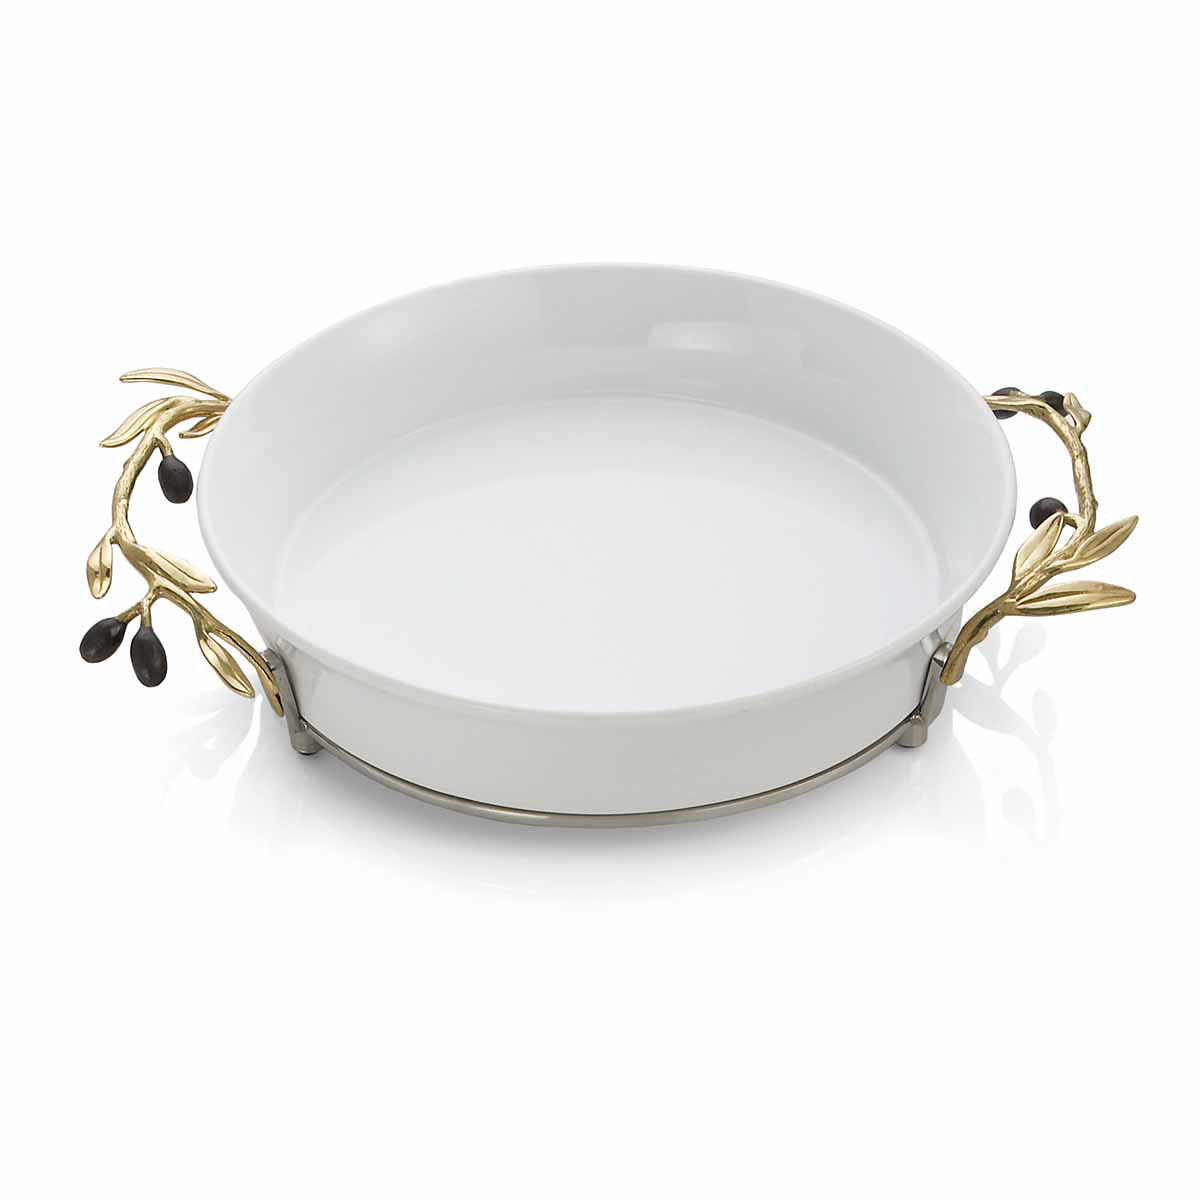 Michael Aram Olive Branch Gold Pie Dish